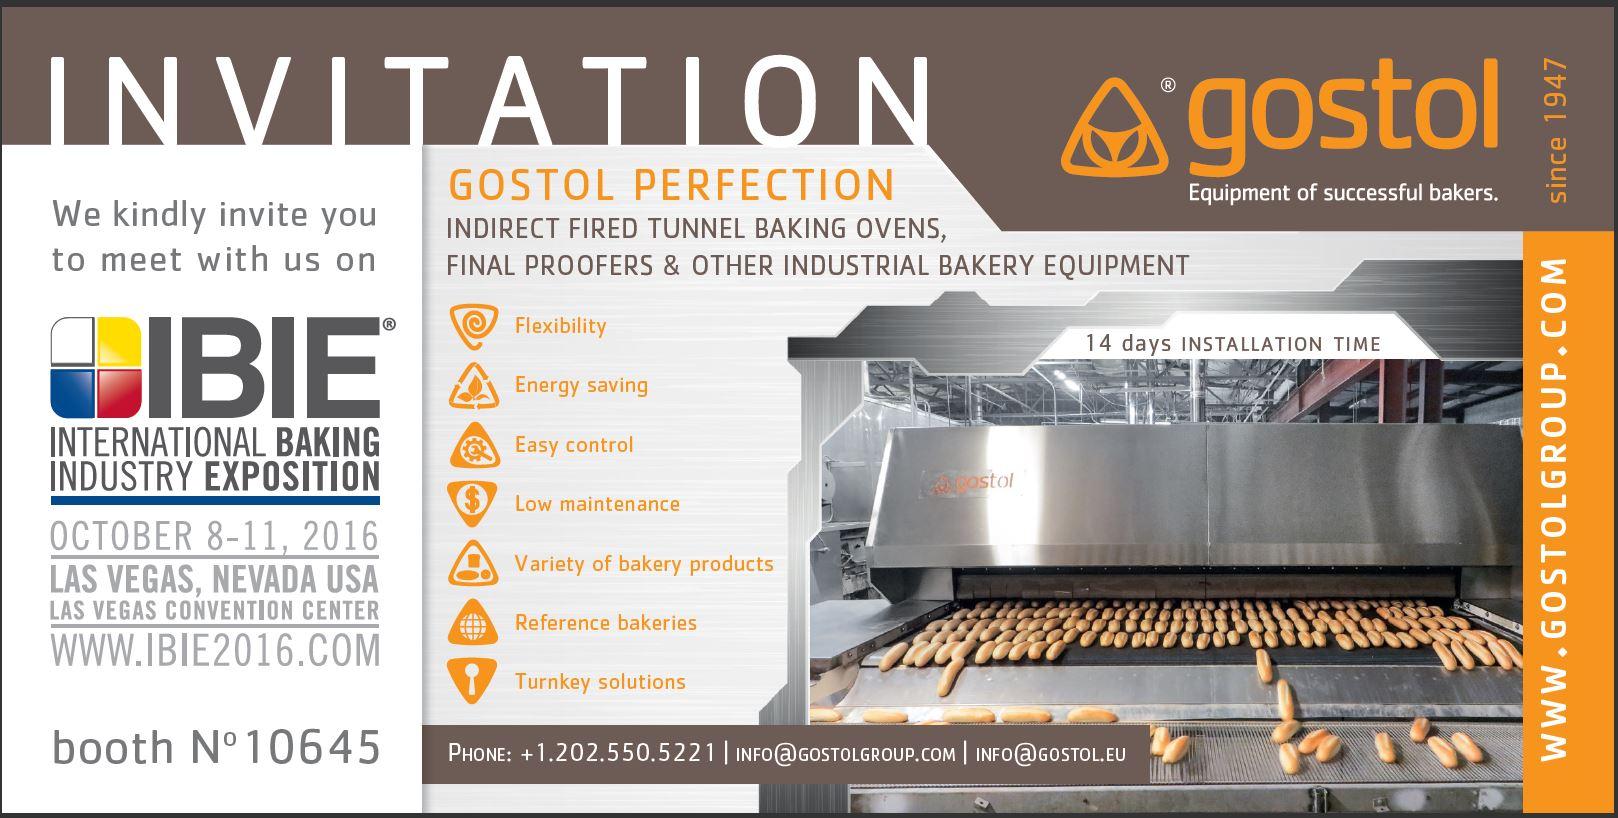 Gostol | Gostol invites you on IBIE, Las Vegas exhibition